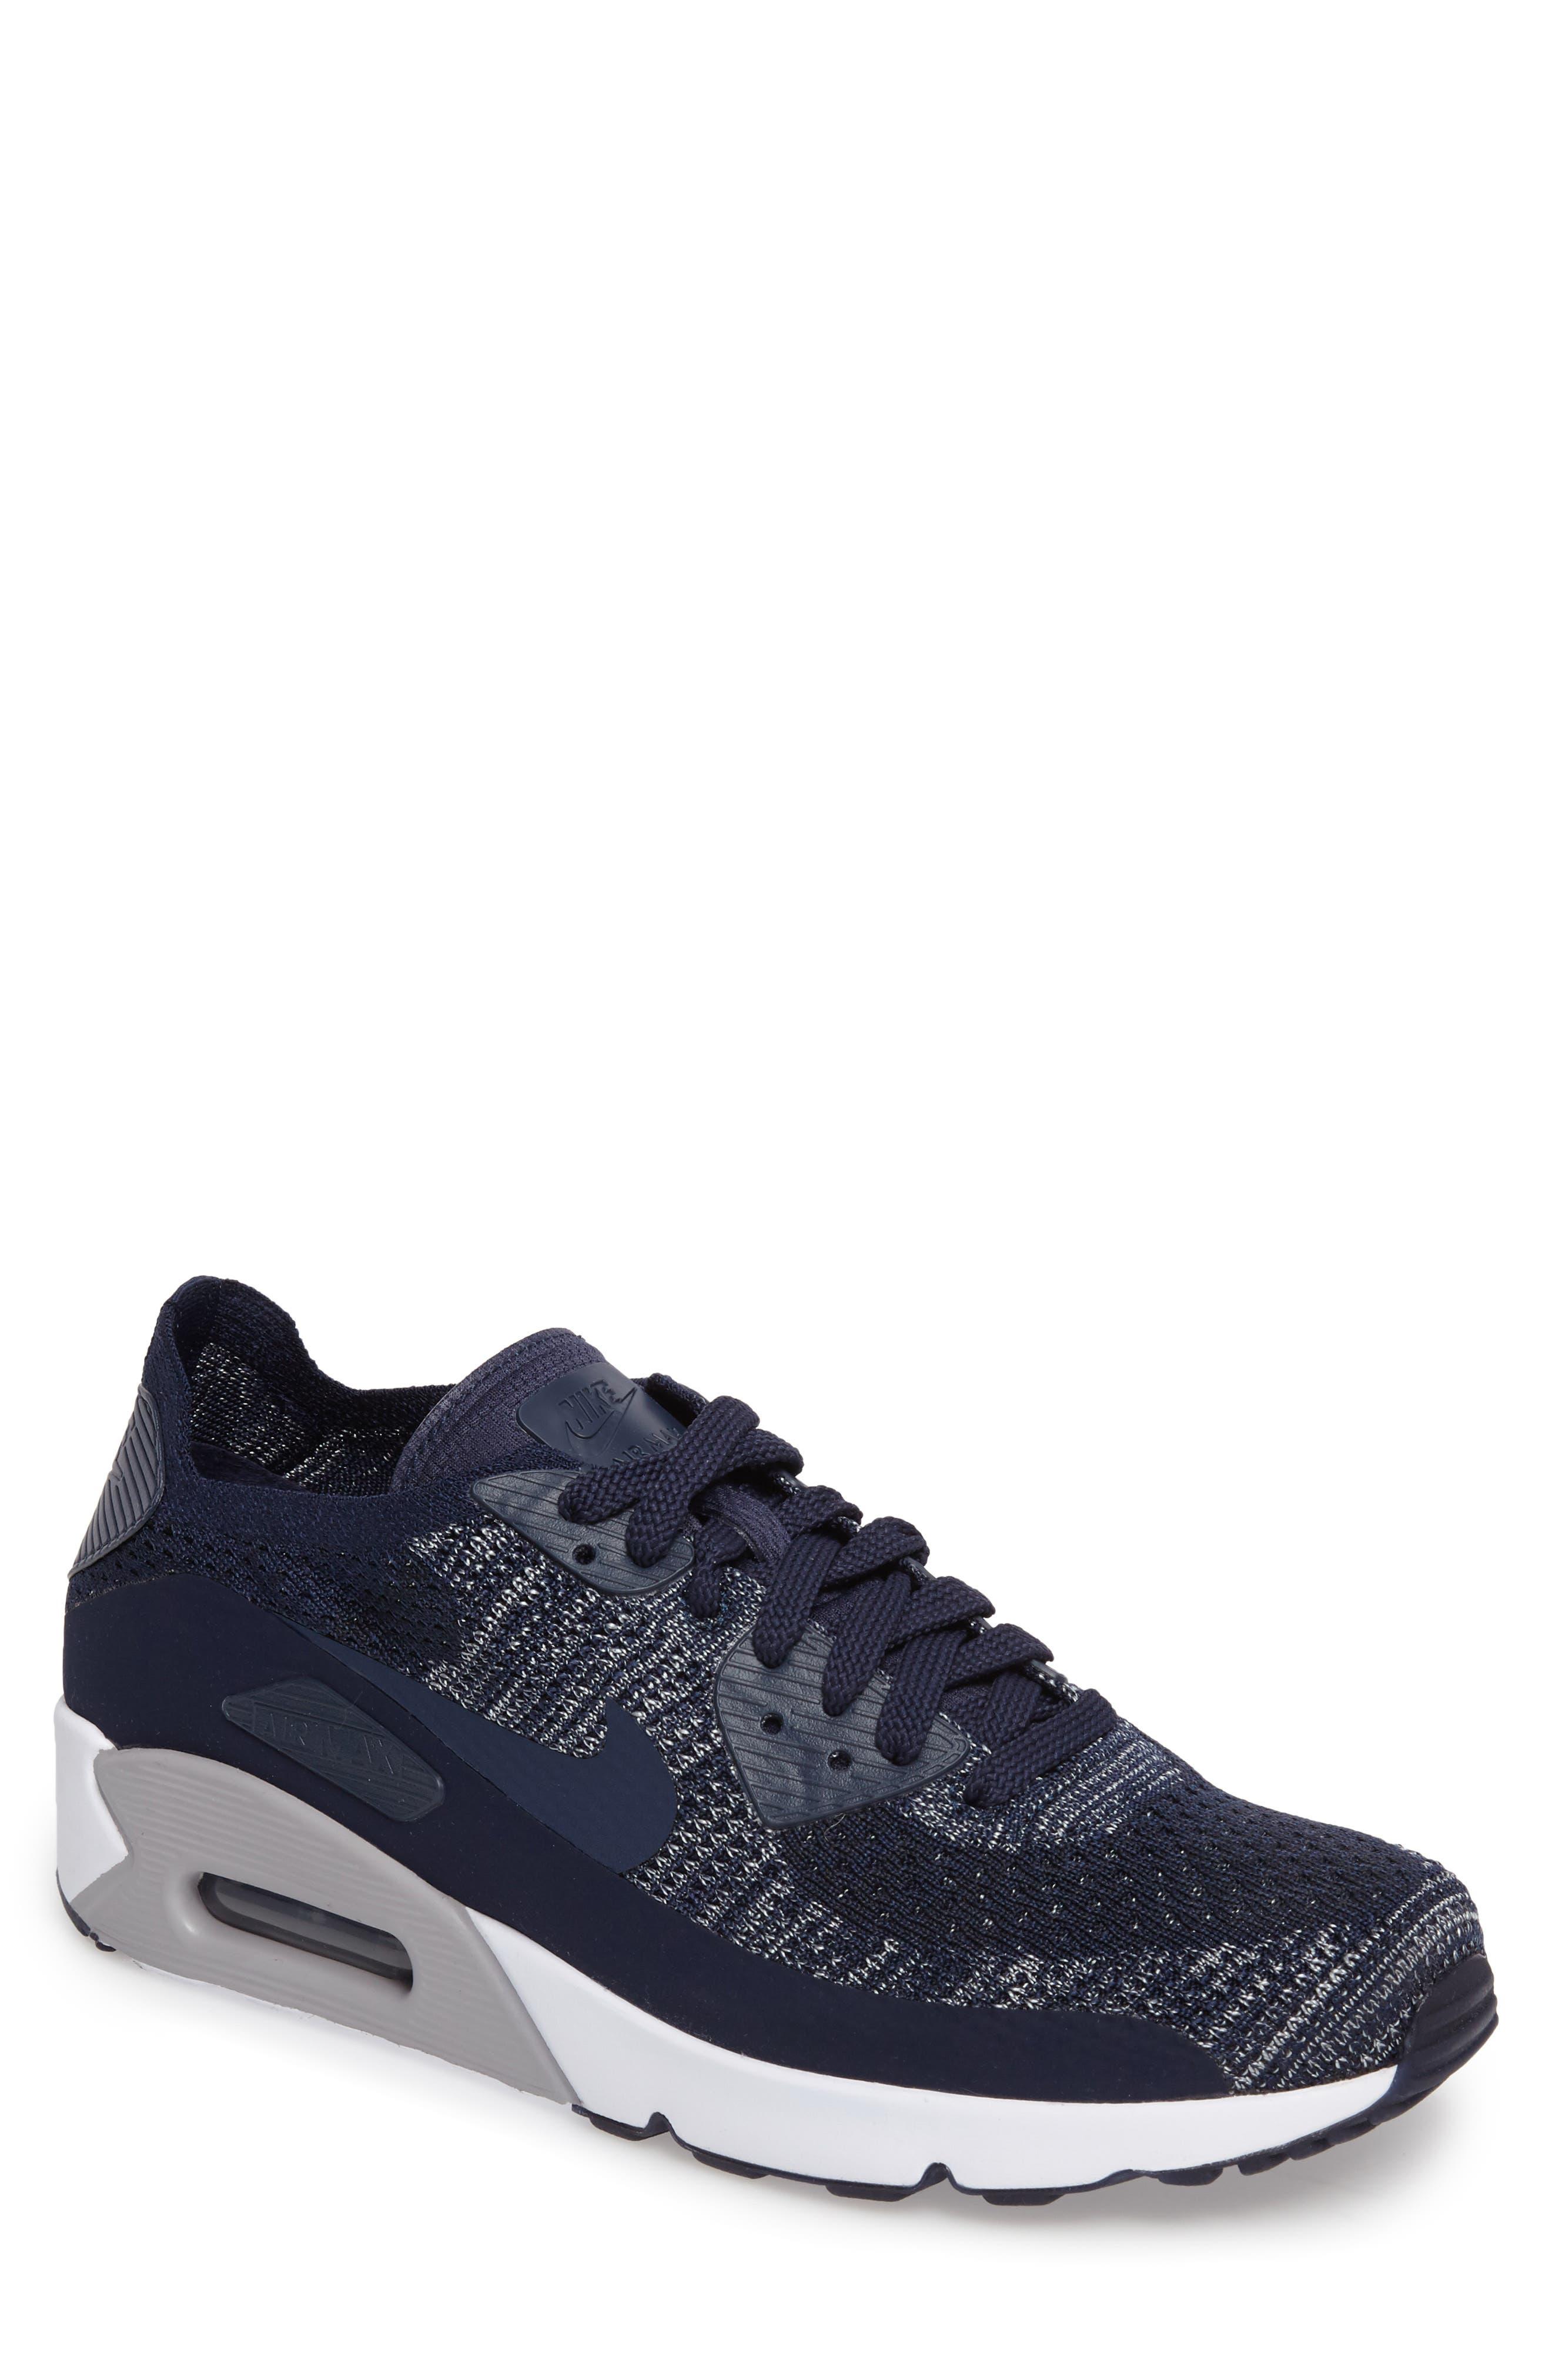 Air Max 90 Ultra 2.0 Flyknit Sneaker,                         Main,                         color, Navy/ Navy/ Grey